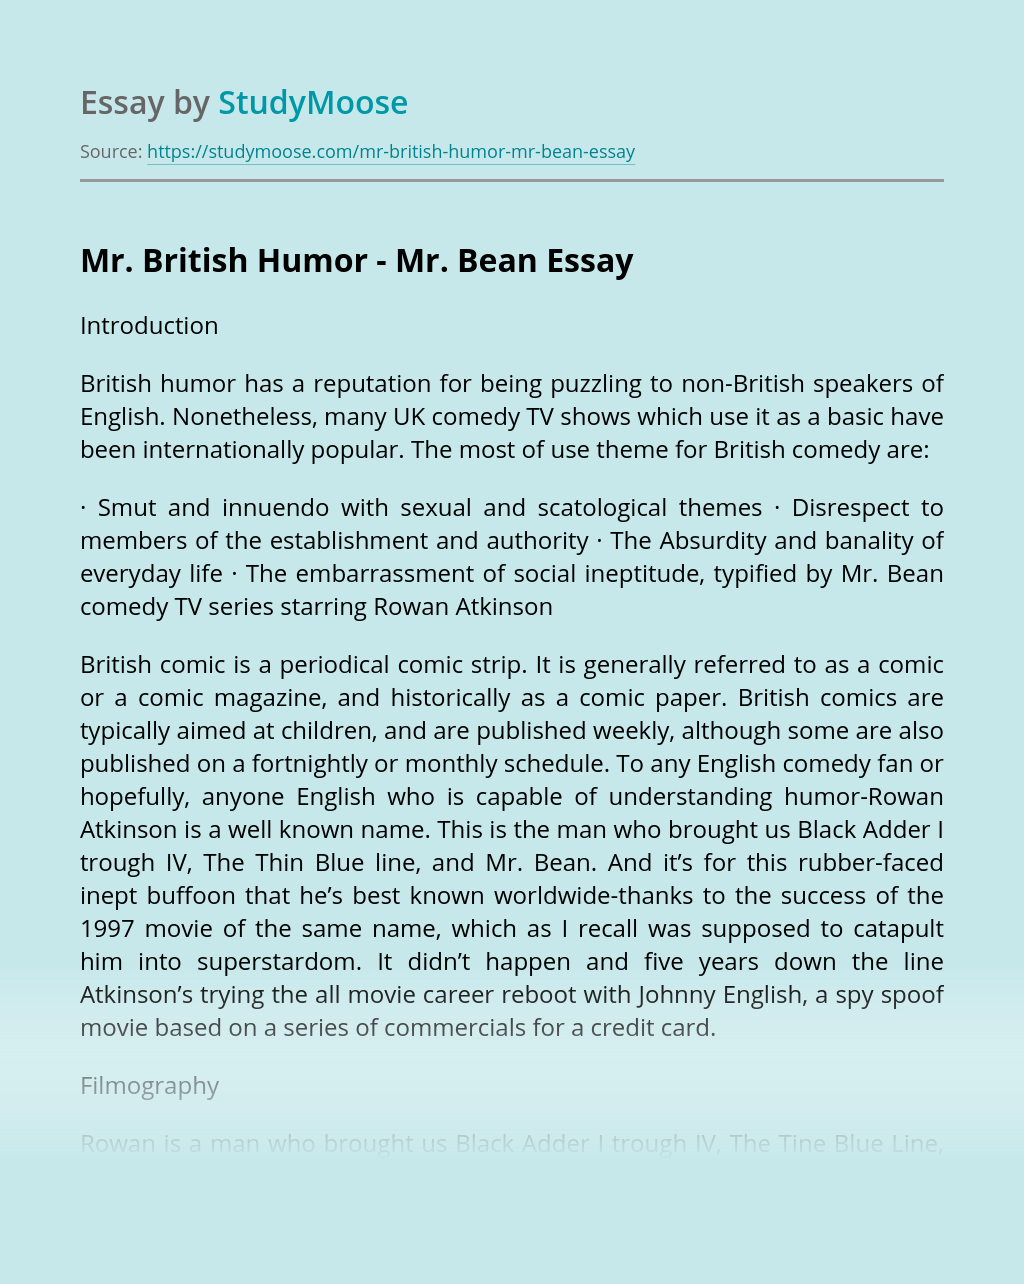 Mr. British Humor - Mr. Bean